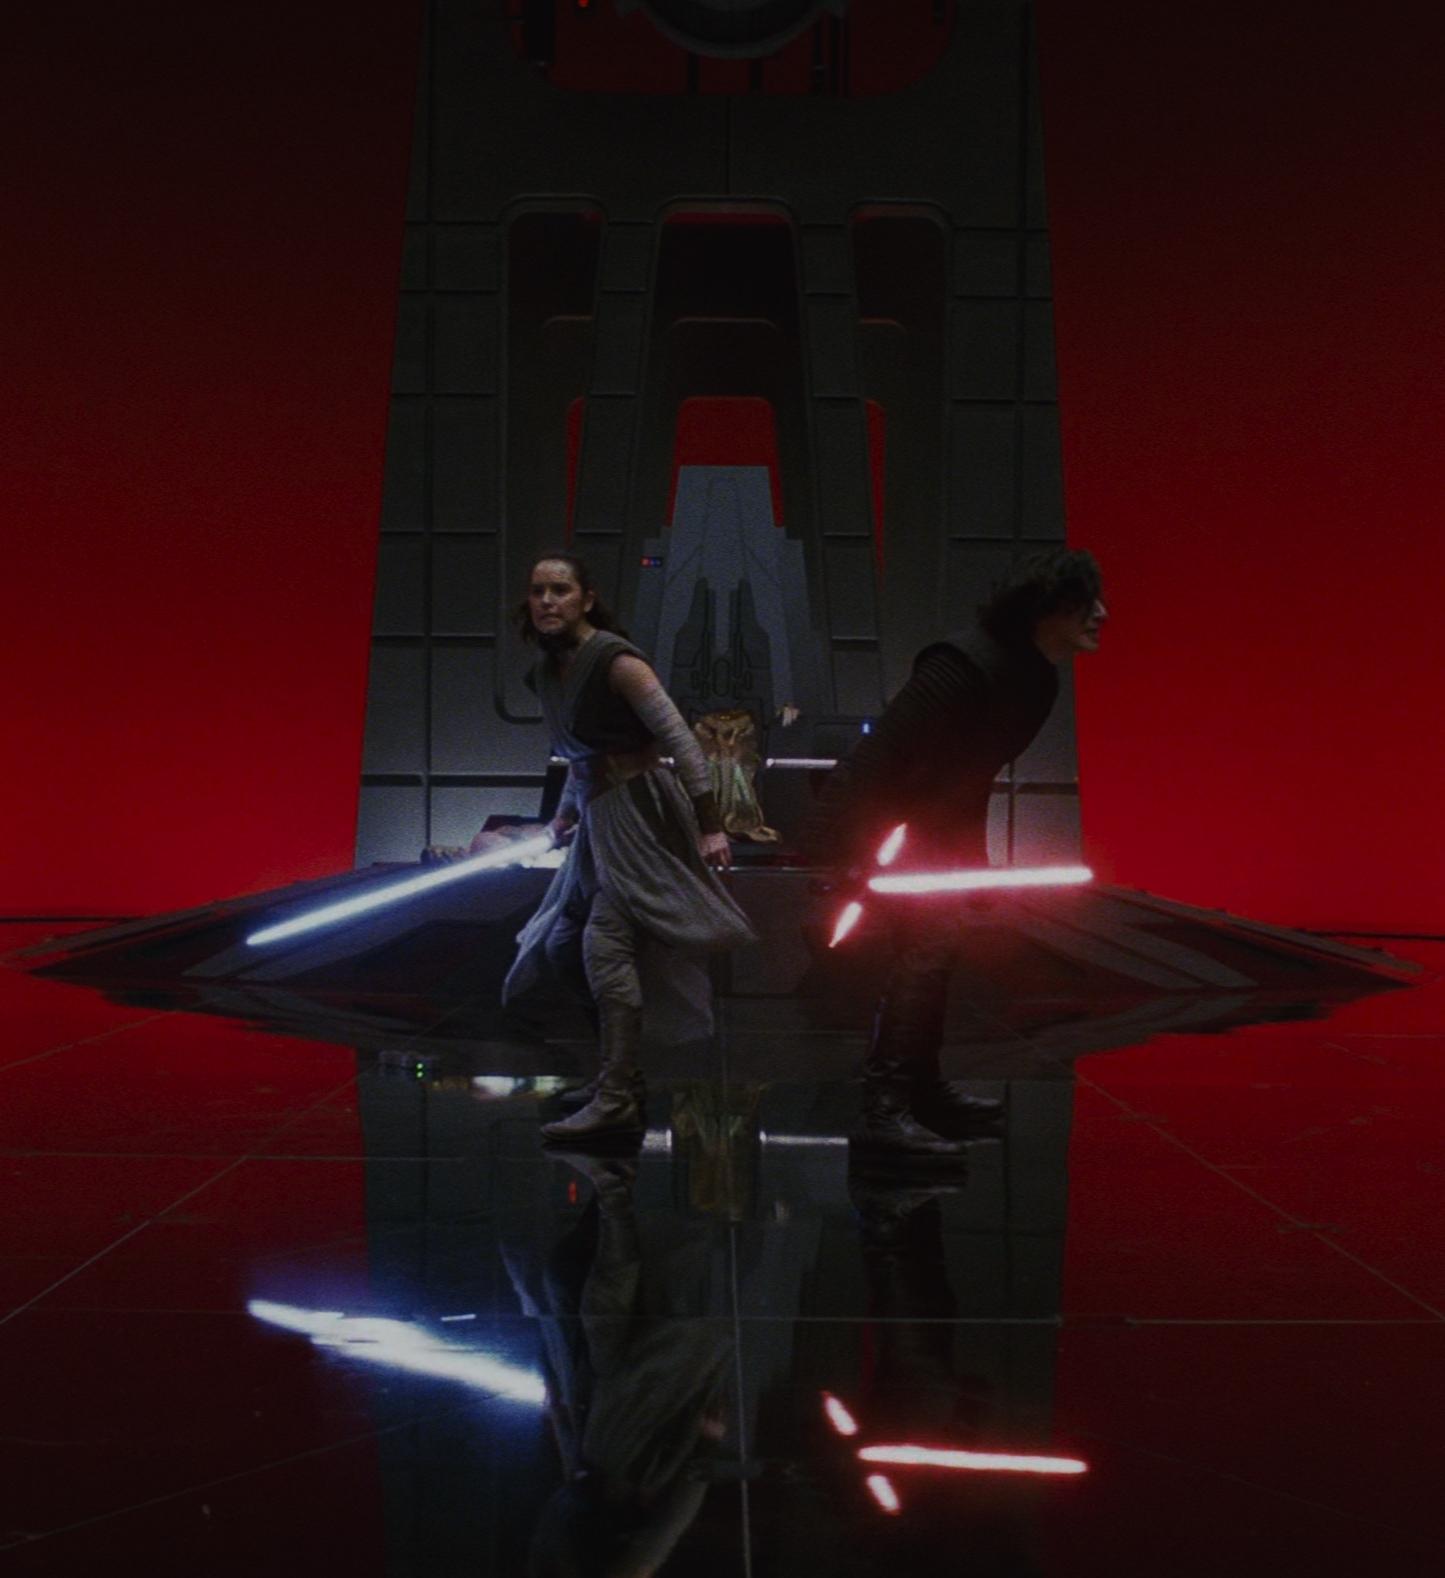 StarWarsLastJedi.mkv snapshot 01.45.05 2019.04.21 11.08.37 20 Reasons Why Star Wars: The Last Jedi Is The Best Film In The Saga So Far